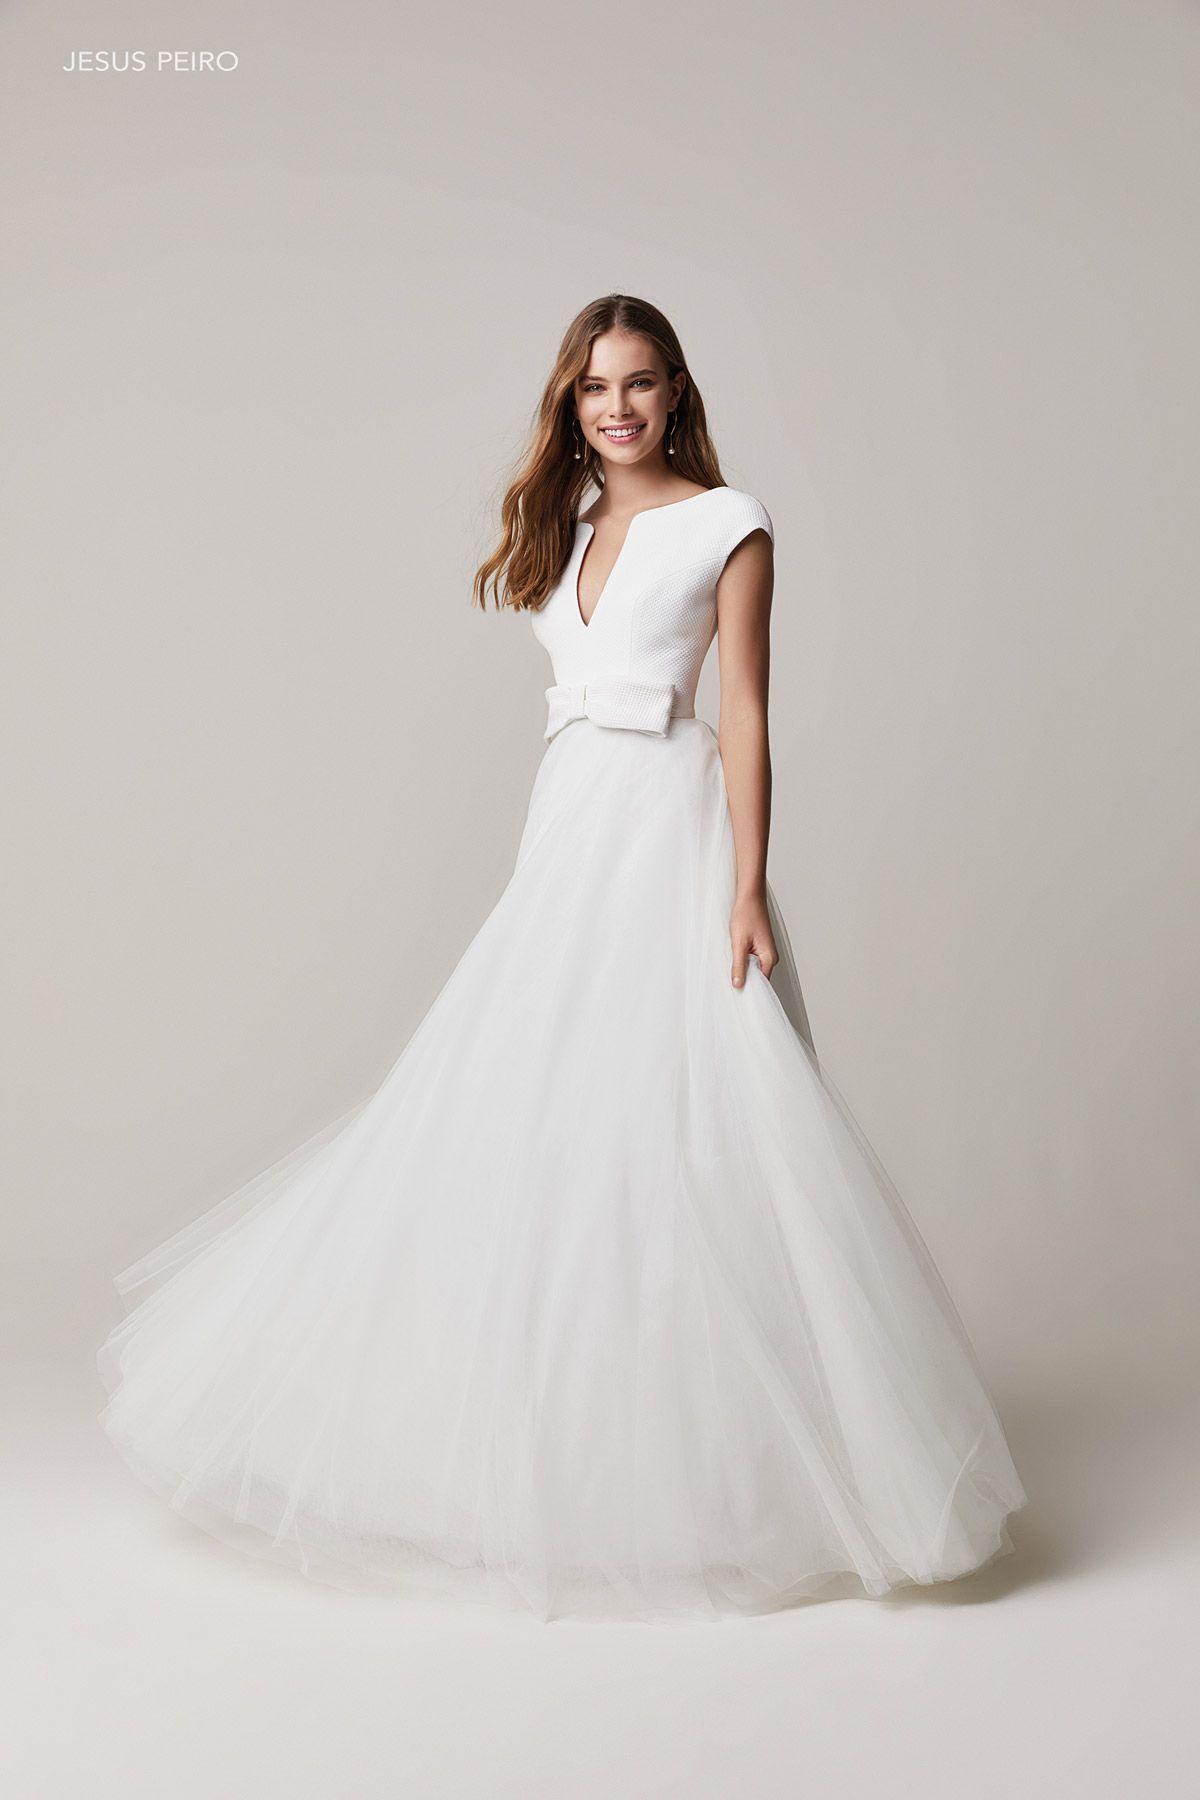 Jesus Peiro Amalia Collection 2021 Wedding Dresses Dresses New Wedding Dresses [ 1800 x 1200 Pixel ]